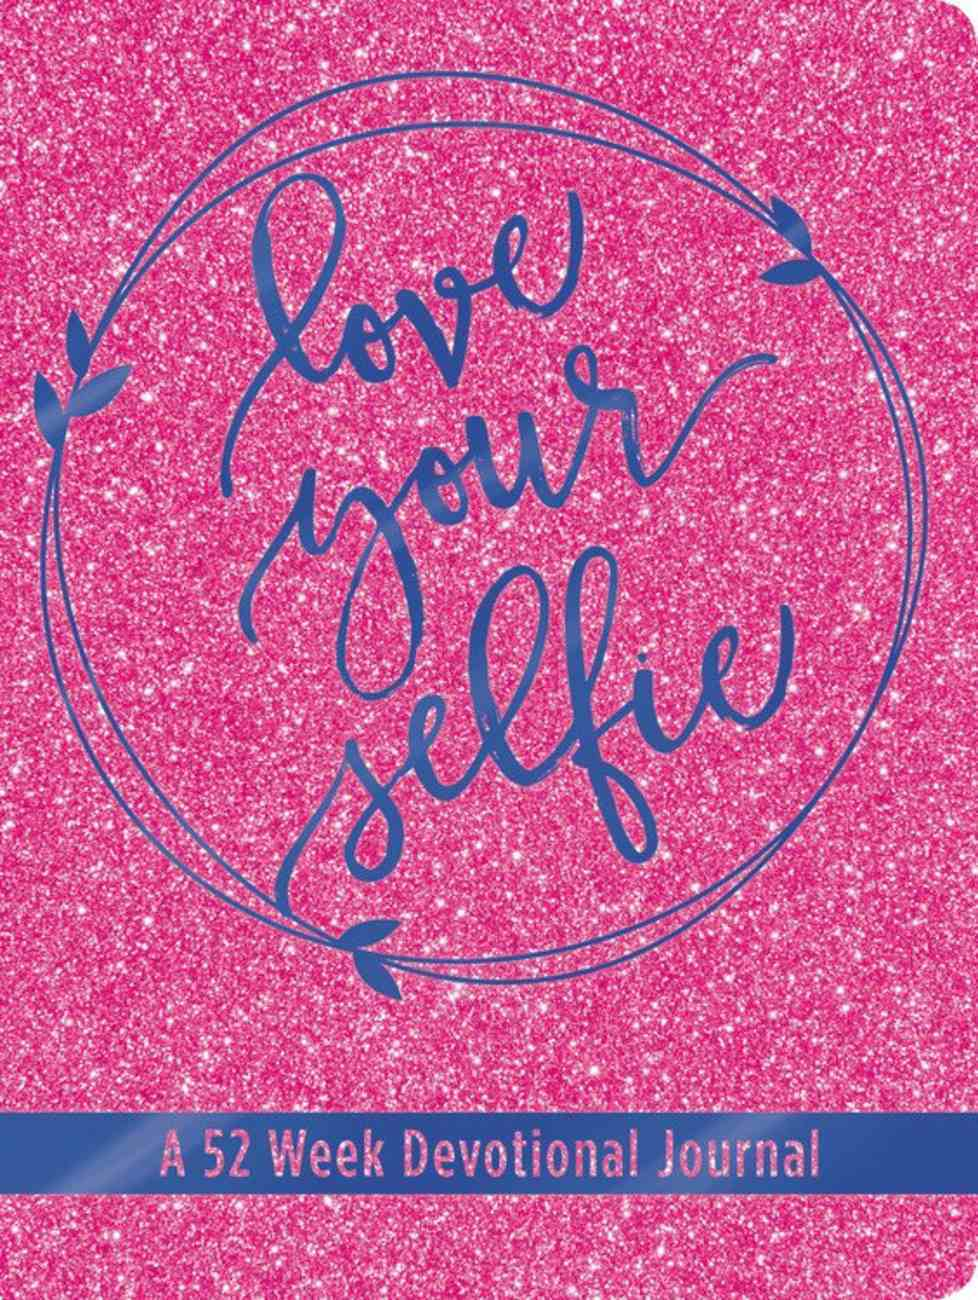 Love Your Selfie: A 52 Week Devotional Journal Imitation Leather